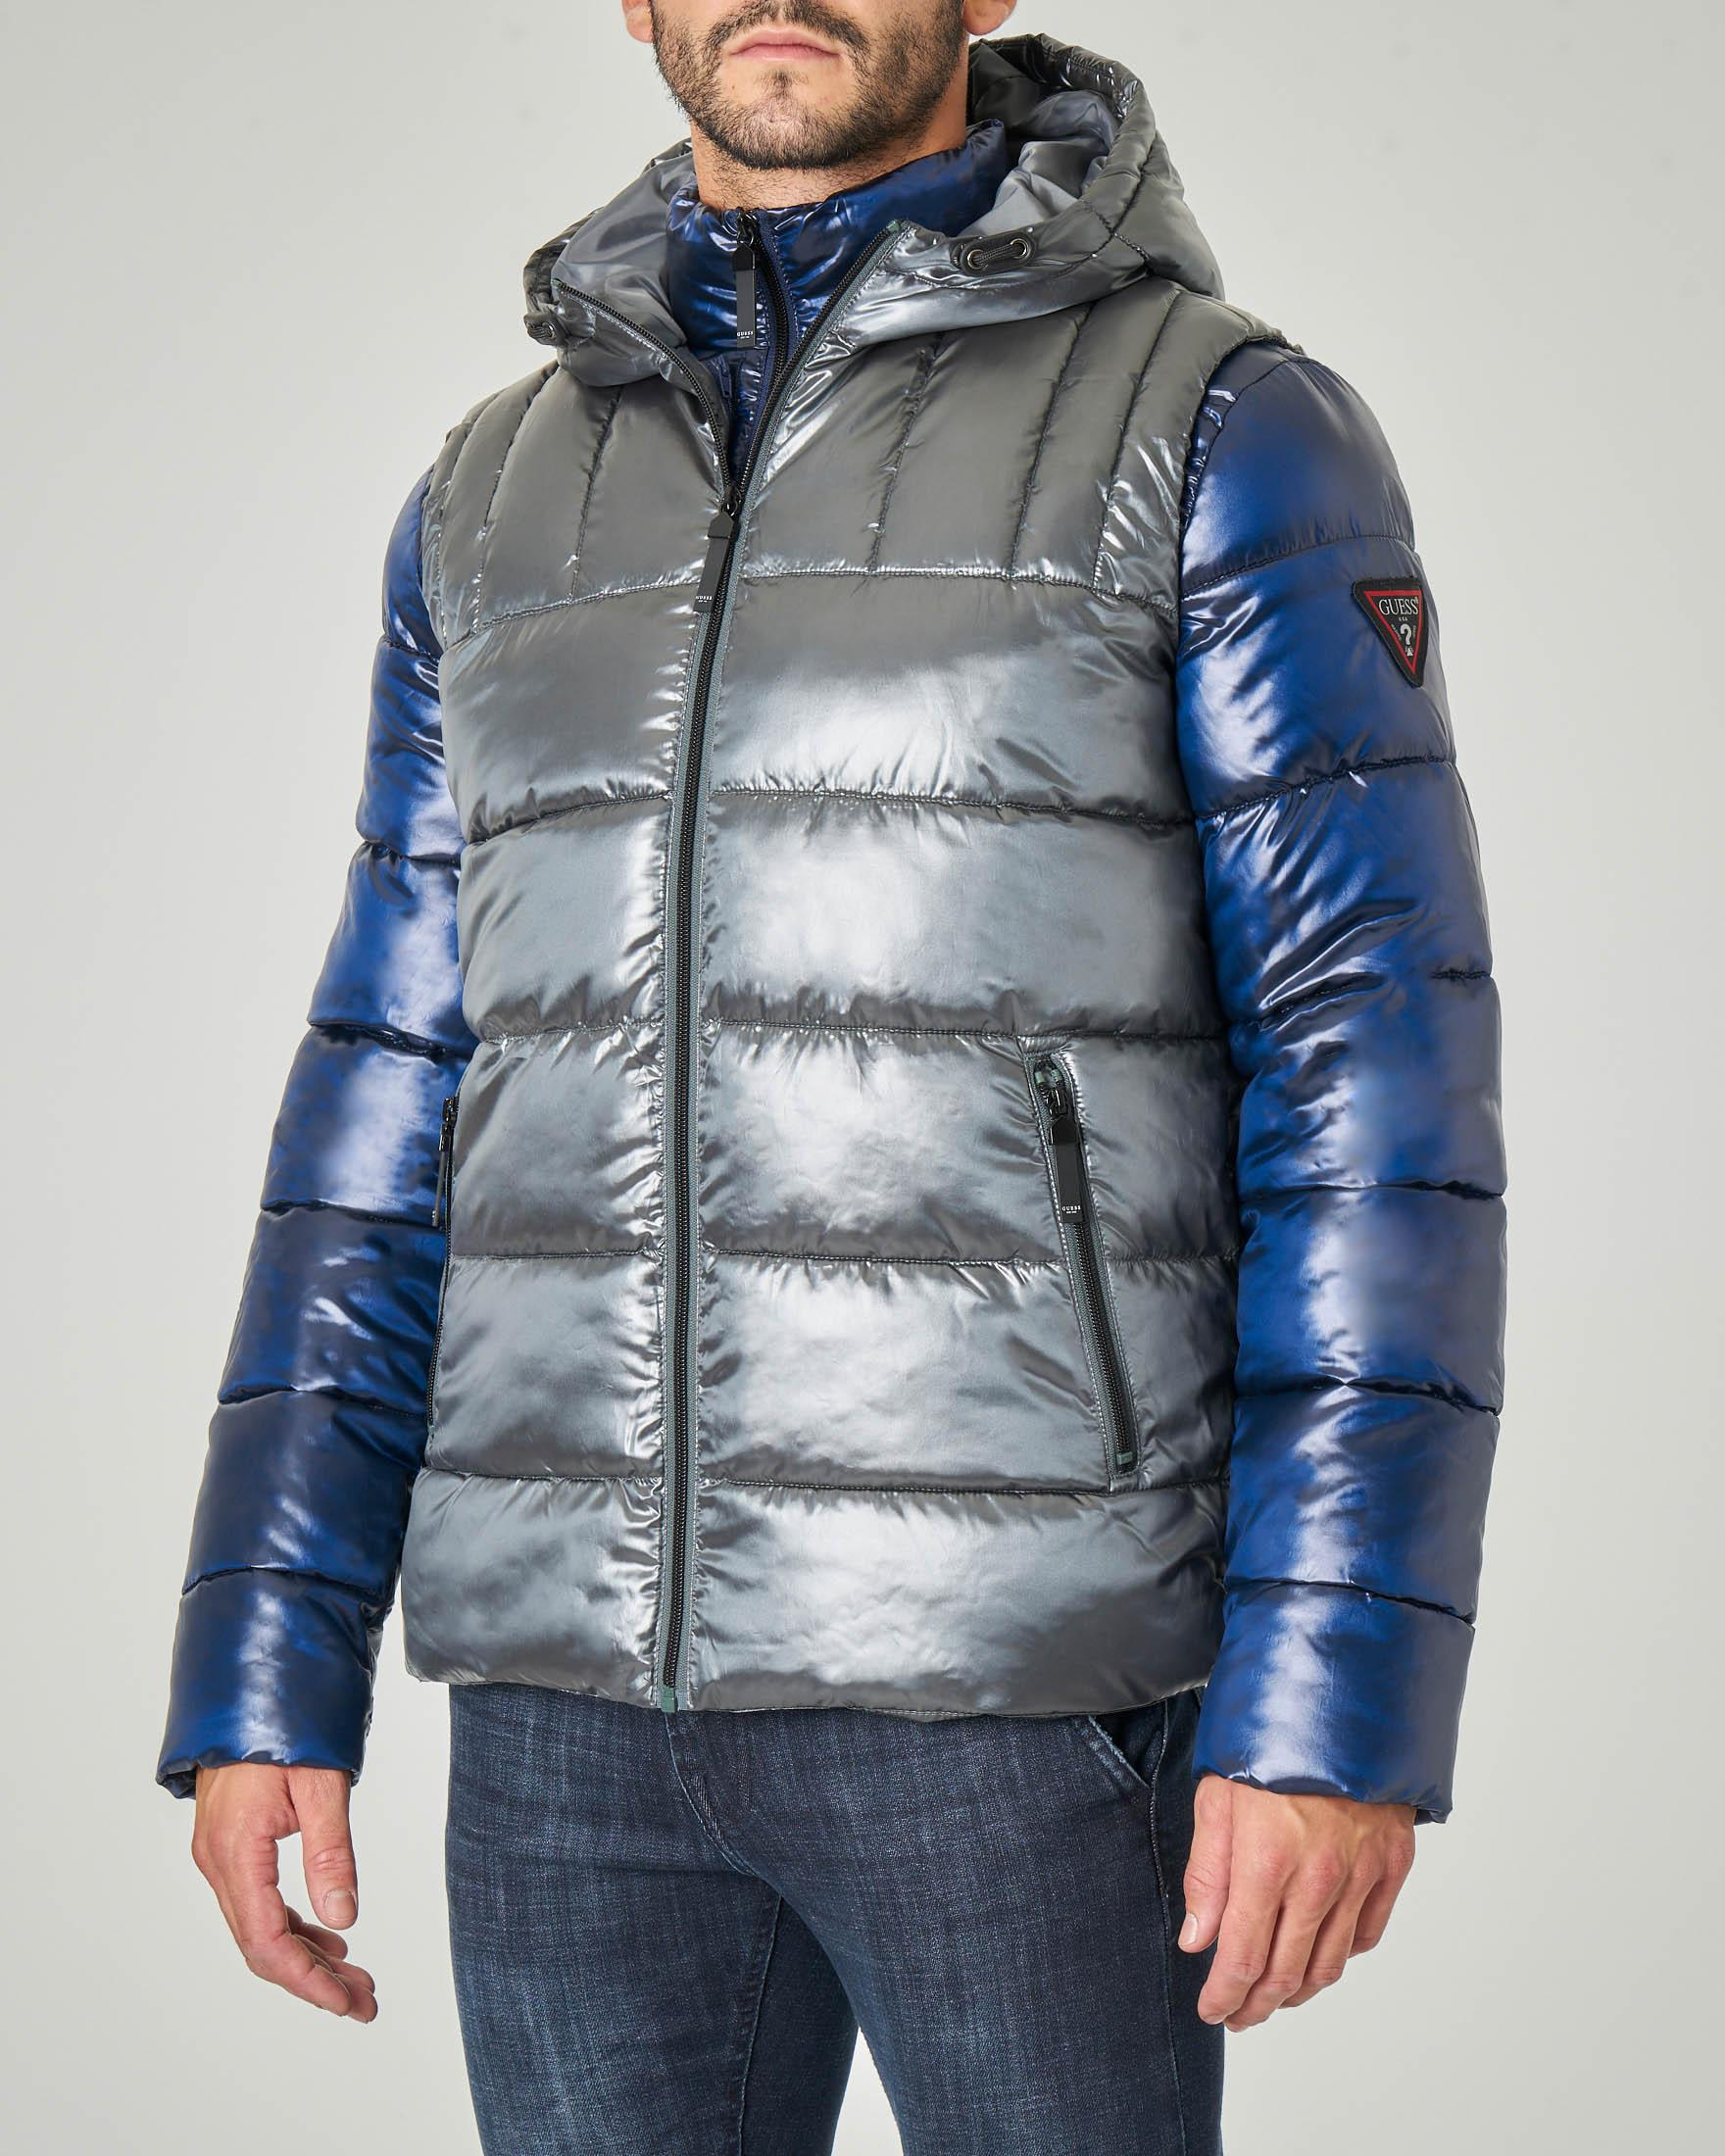 Doppia giacca composta da gilet grigio e piumino blu